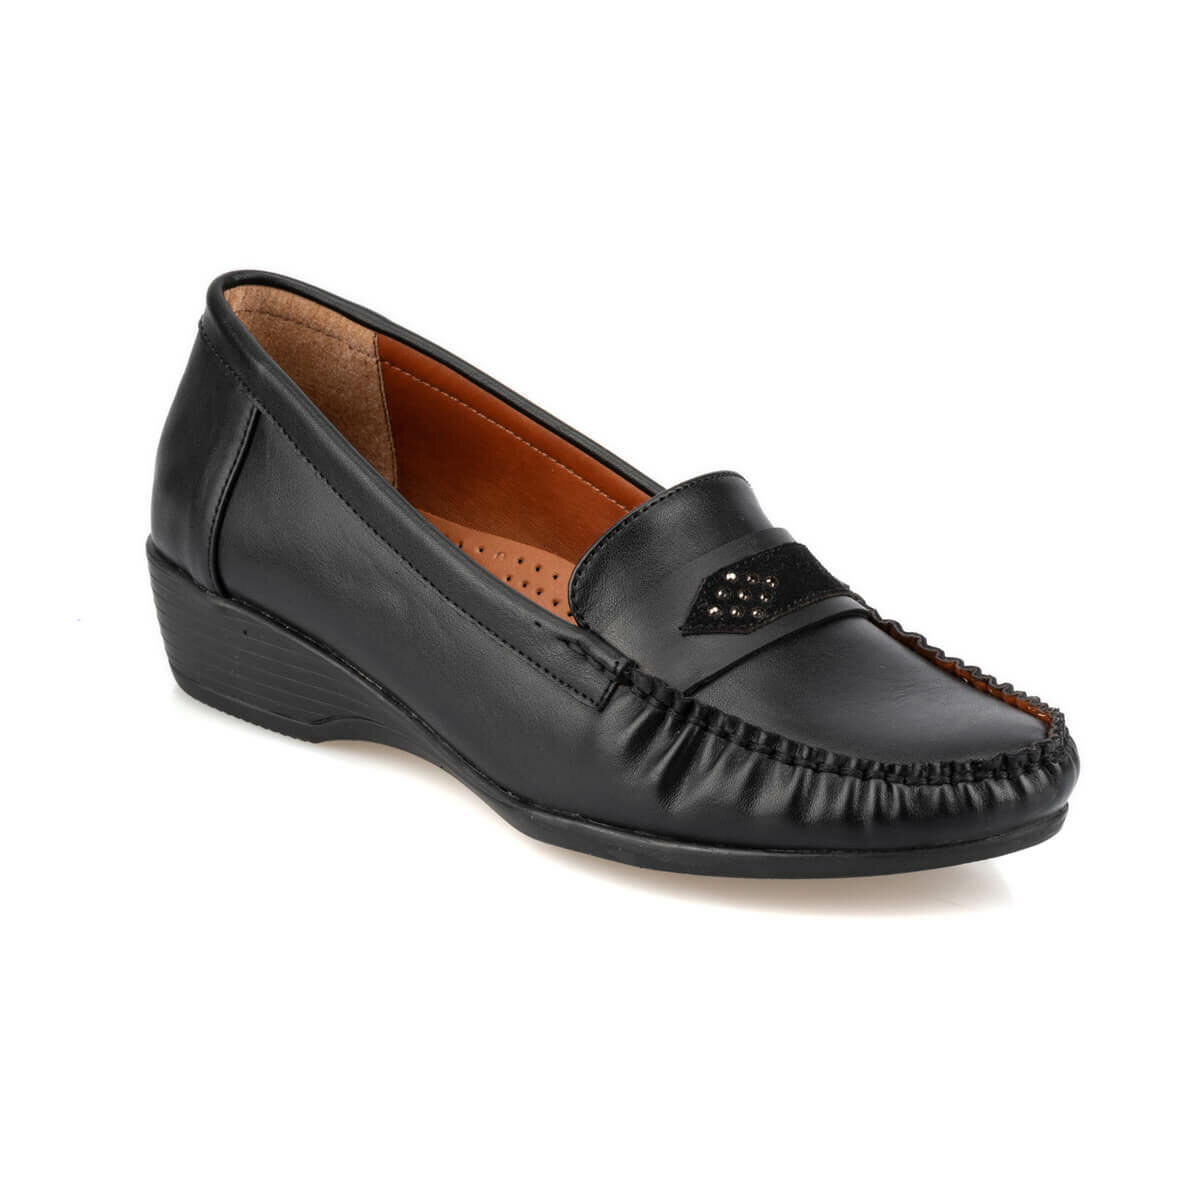 FLO 92. 151014.Z Black Women Loafer Shoes Polaris